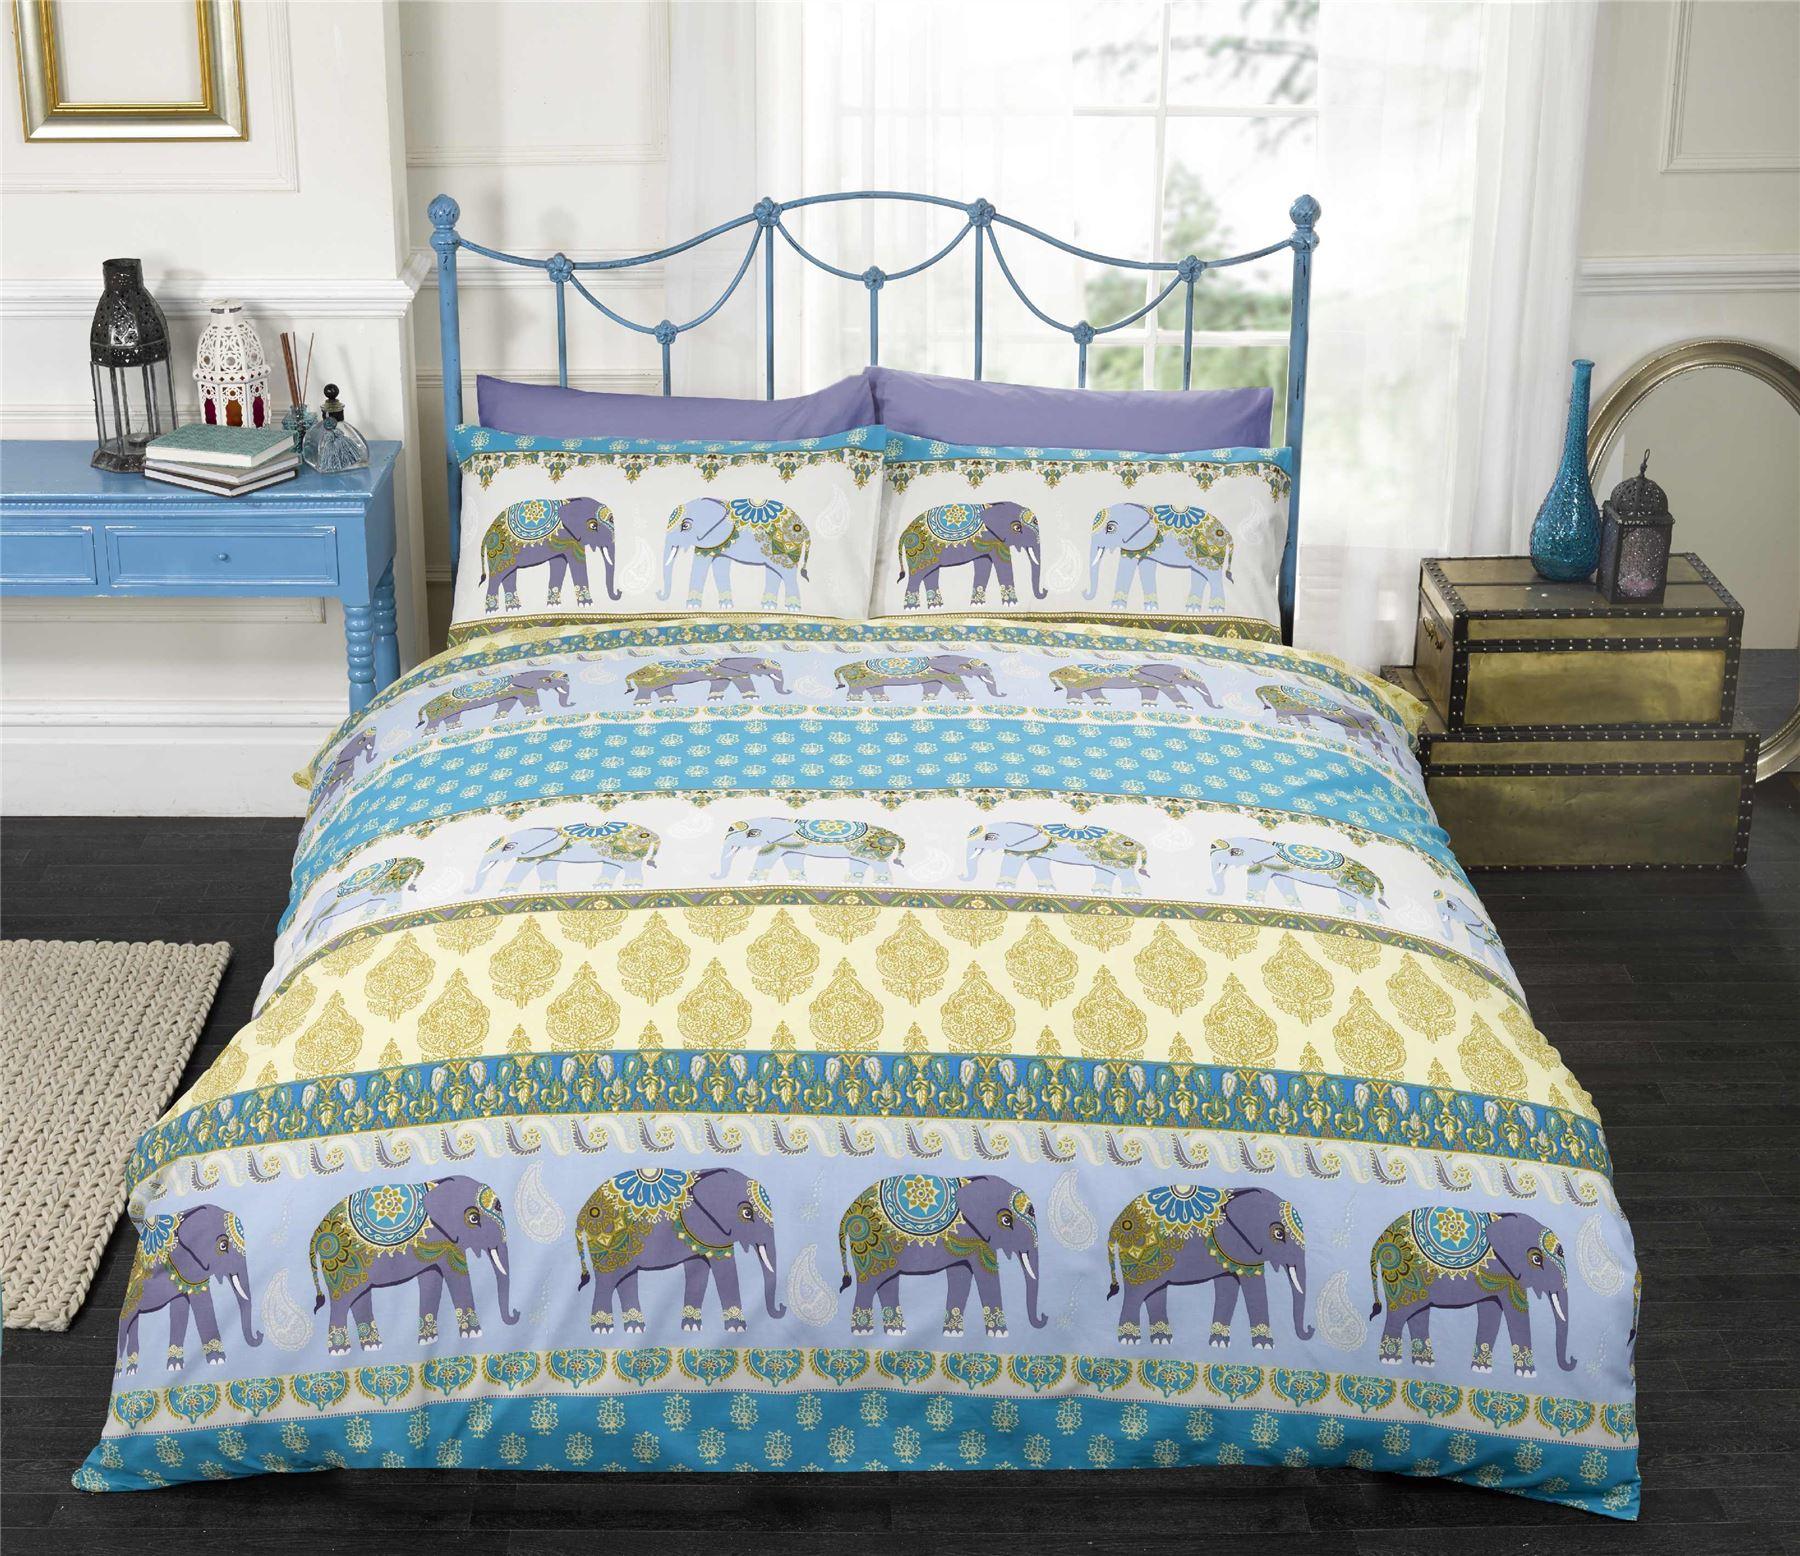 blue indian style elephant duvet cover pillowcase. Black Bedroom Furniture Sets. Home Design Ideas